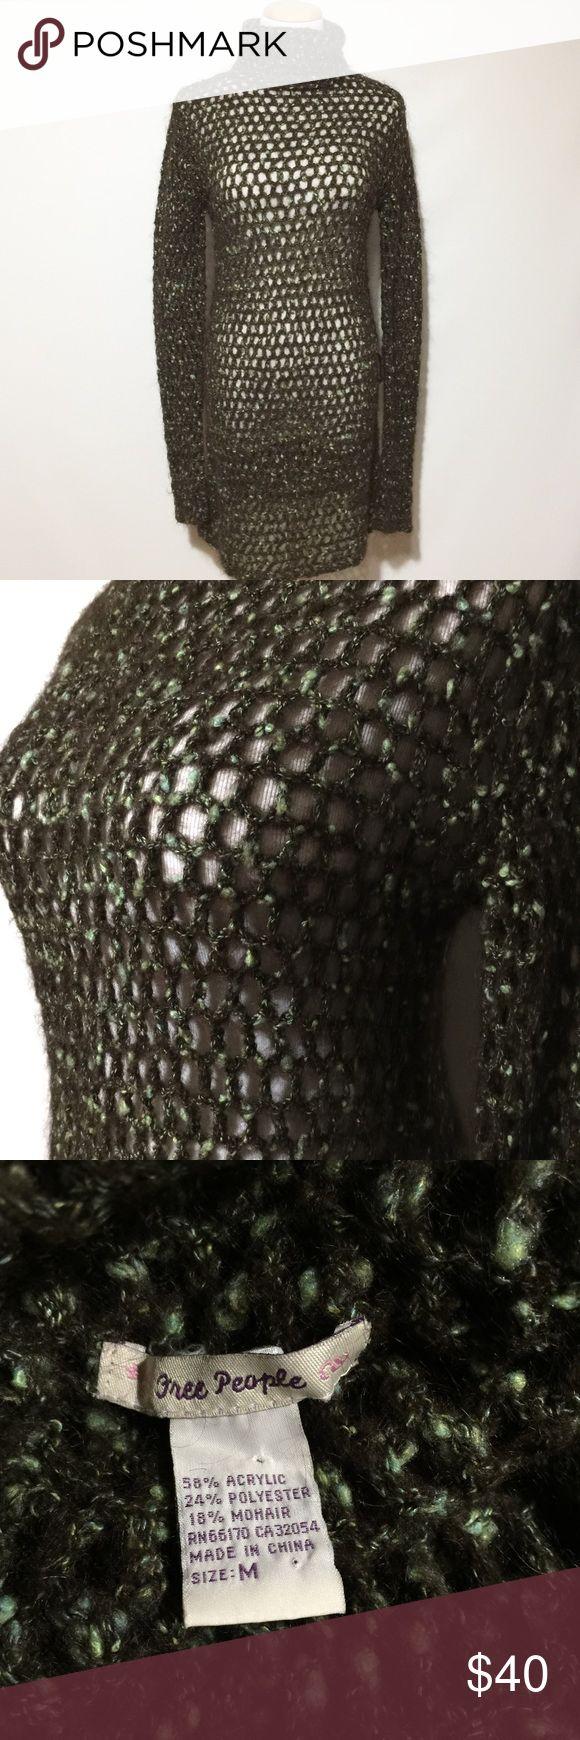 FREE PEOPLE OPEN WEAVE DRESS GUC. Has 2 belt loops. Free People Dresses Midi